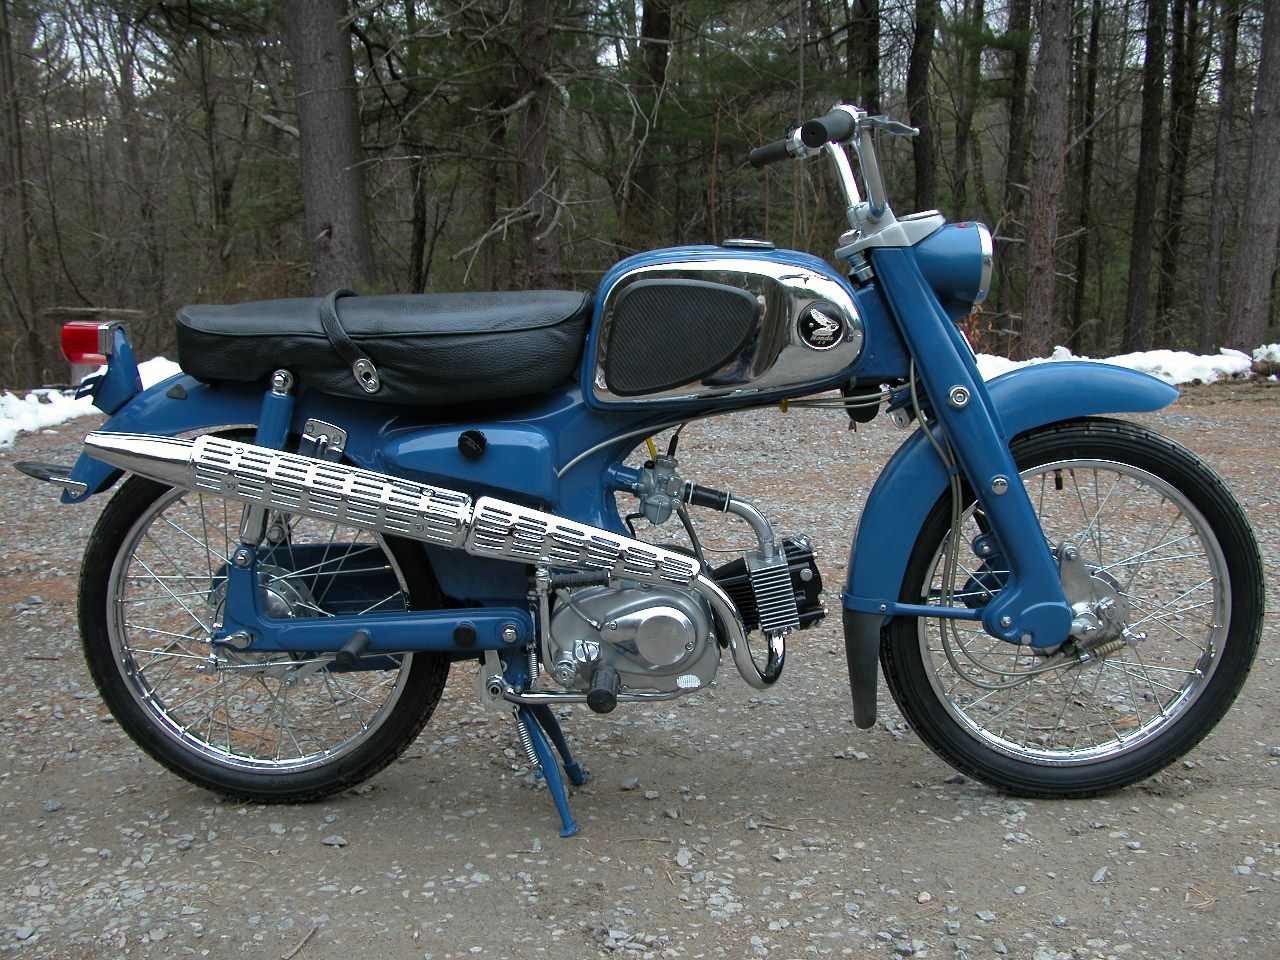 blue 1966 honda sport 50 motorcycles honda motorcycles honda motorcycles cbr honda motorbikes. Black Bedroom Furniture Sets. Home Design Ideas